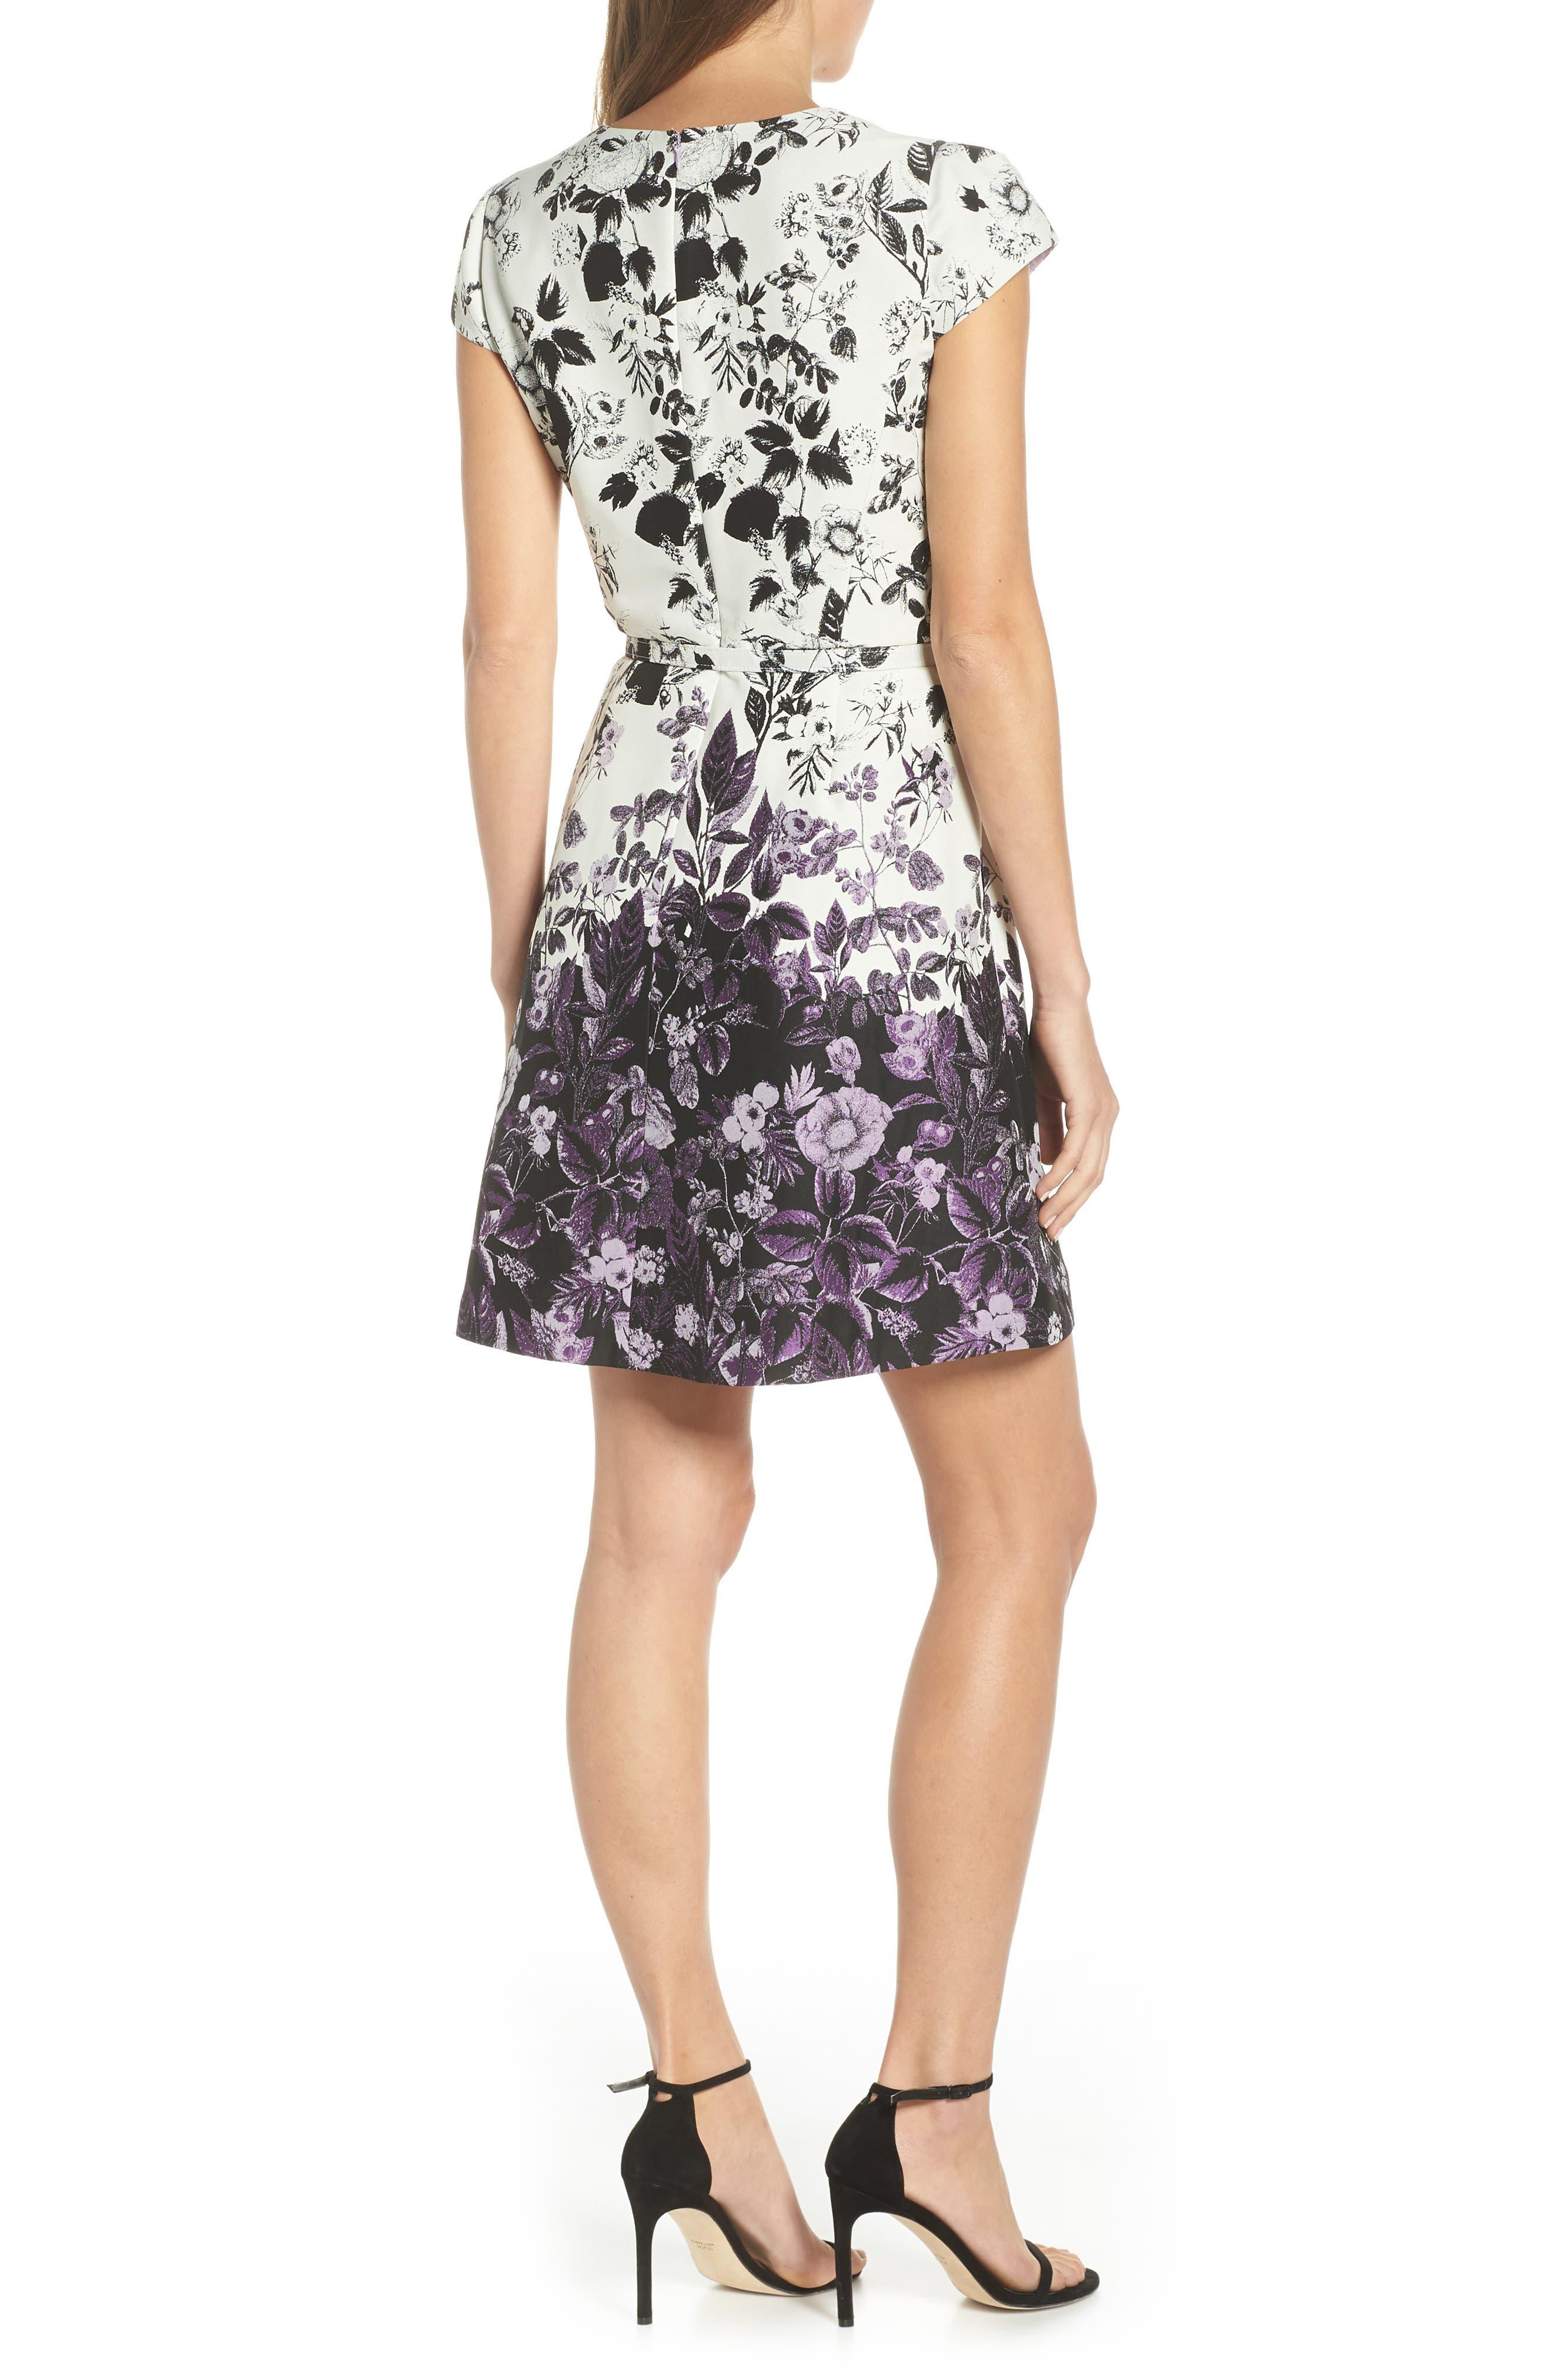 VINCE CAMUTO, Floral Jacquard Fit and Flare Dress, Alternate thumbnail 2, color, PURPLE MULTI